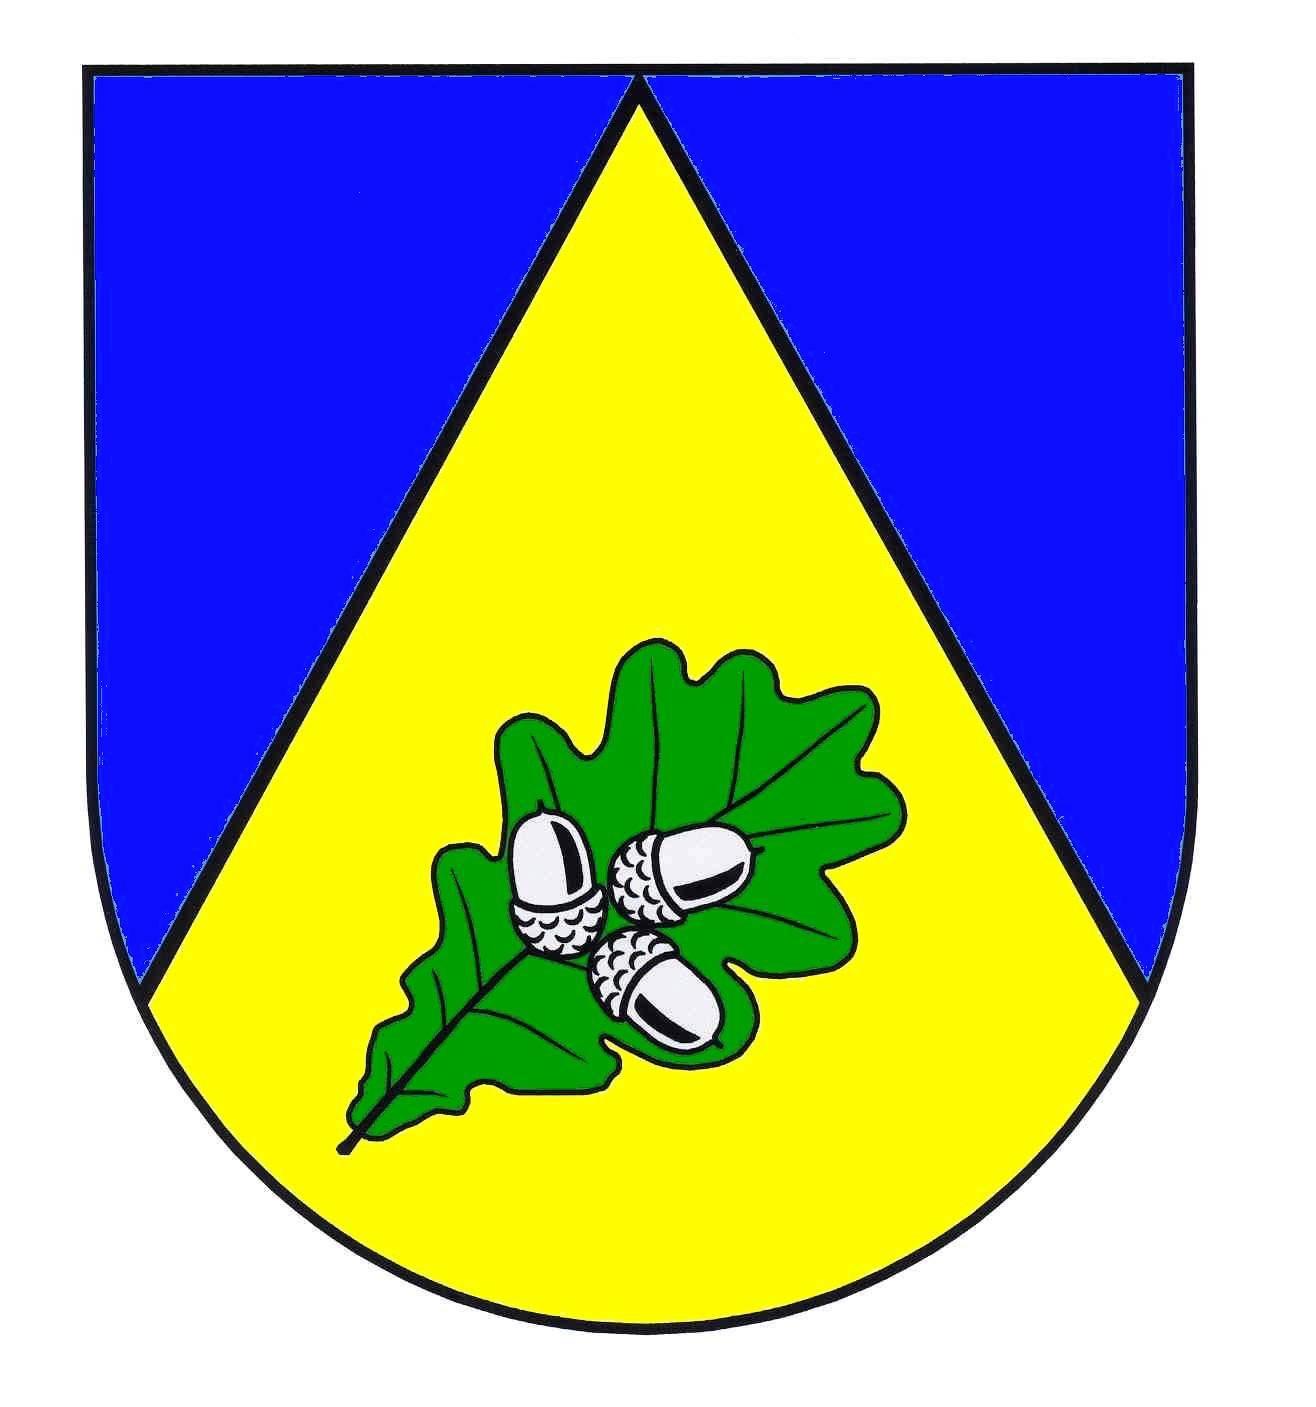 Wappen GemeindeEkenis, Kreis Schleswig-Flensburg